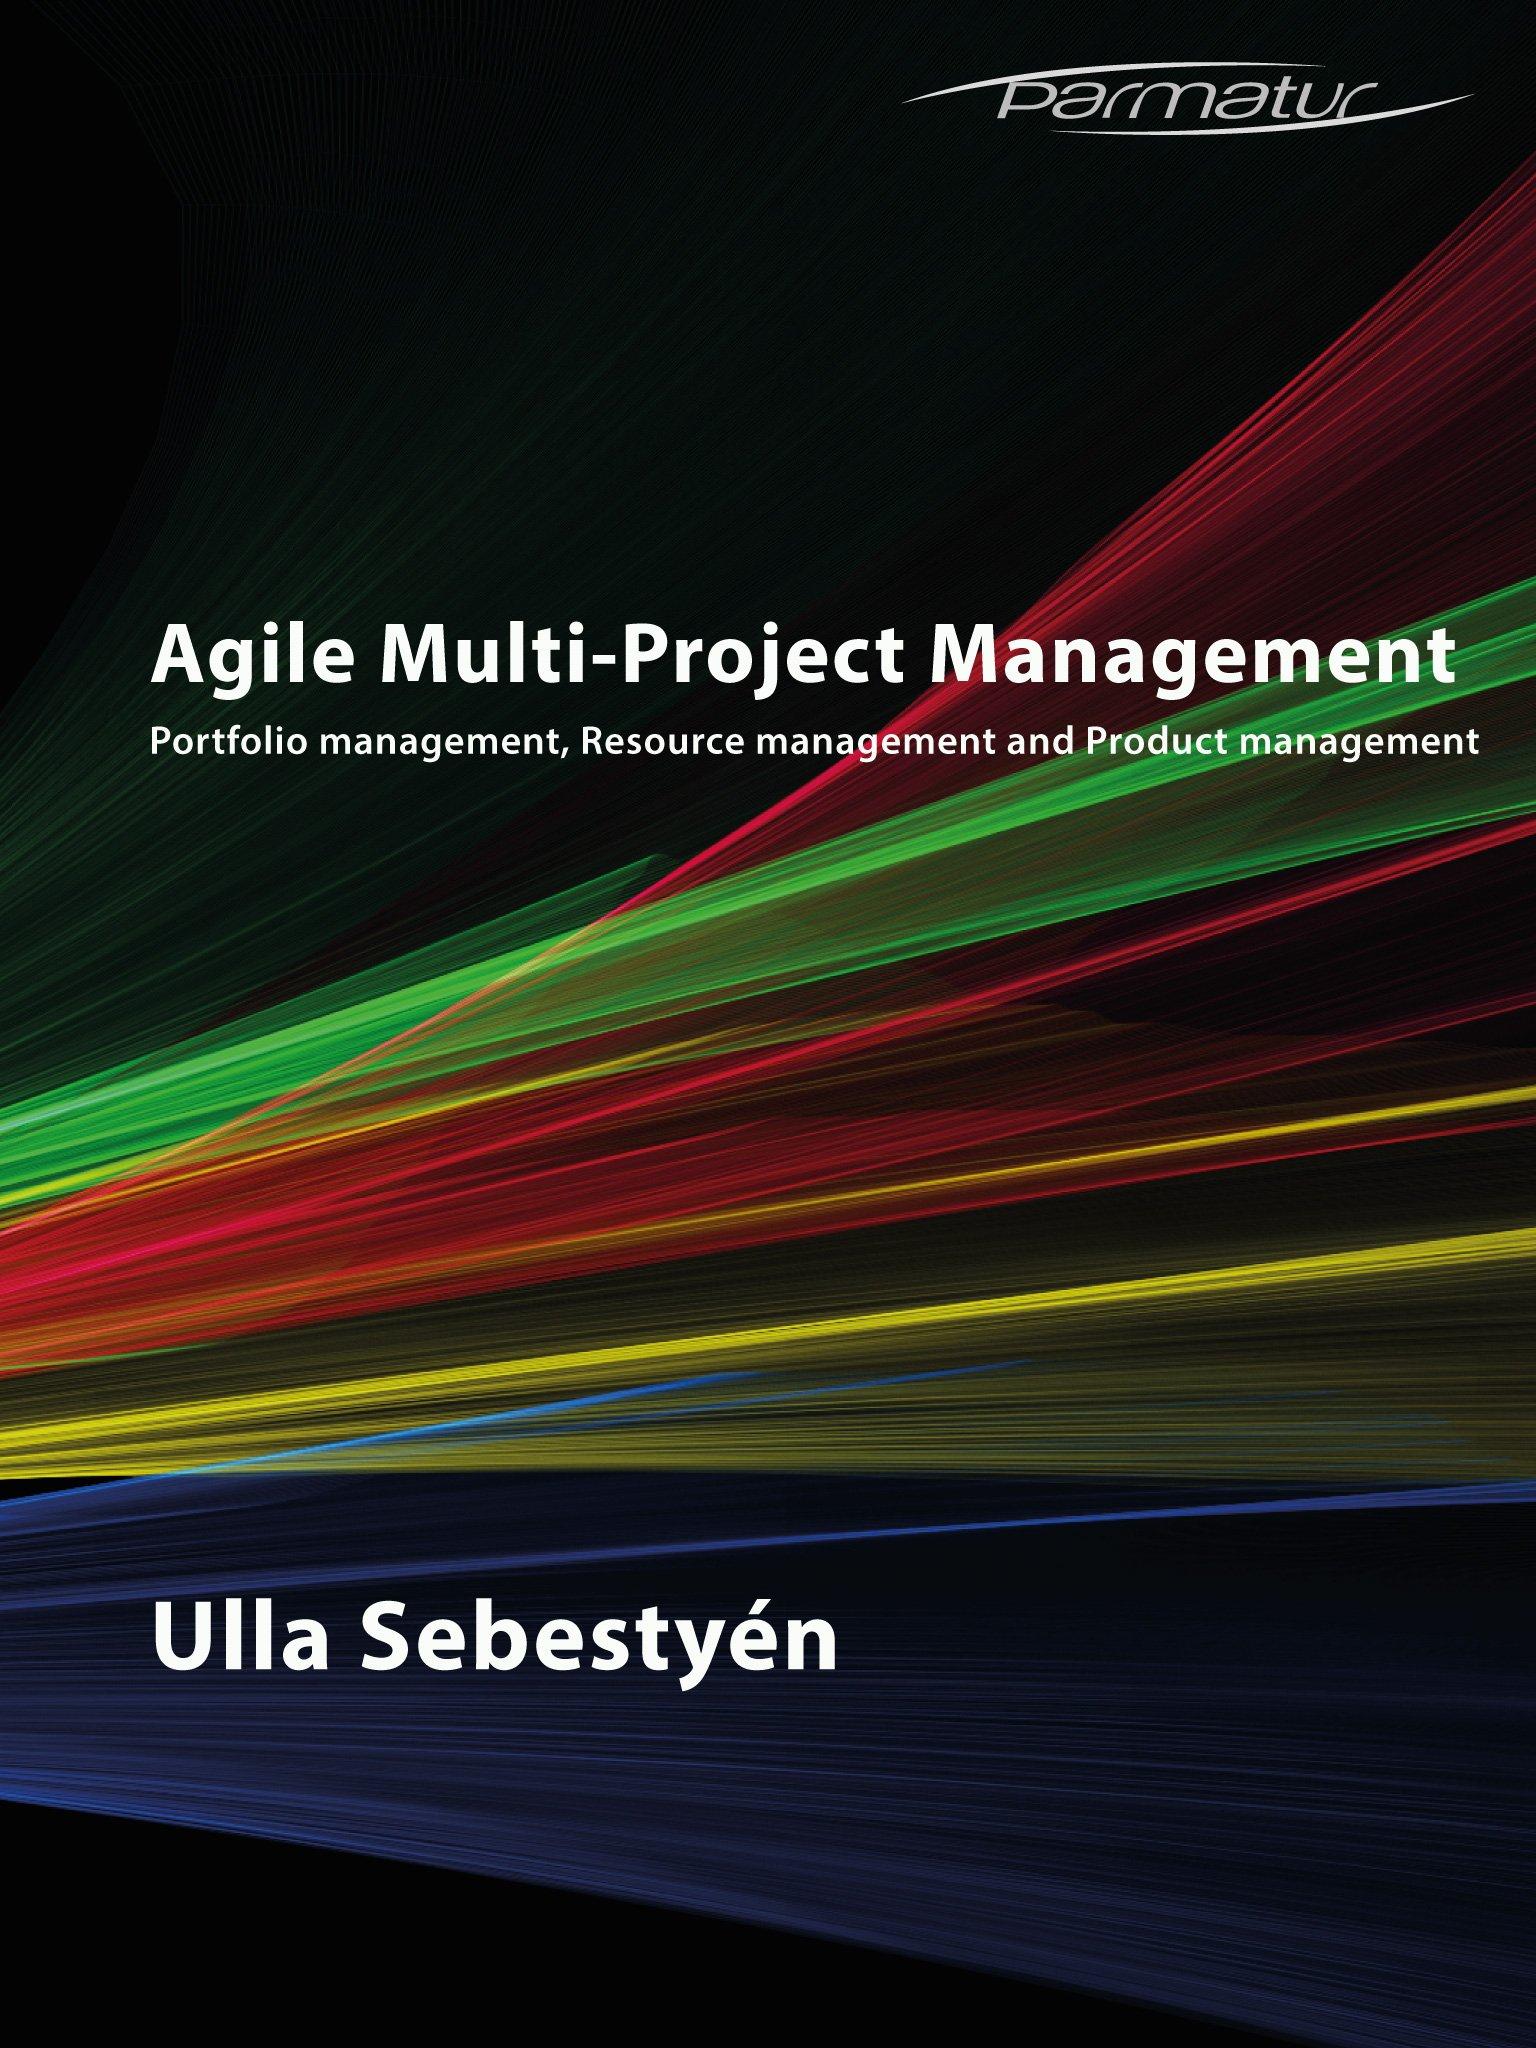 Agile Multi-Project Management: Portfolio management, Resource management and Product management (Agile Product Development Book 1)